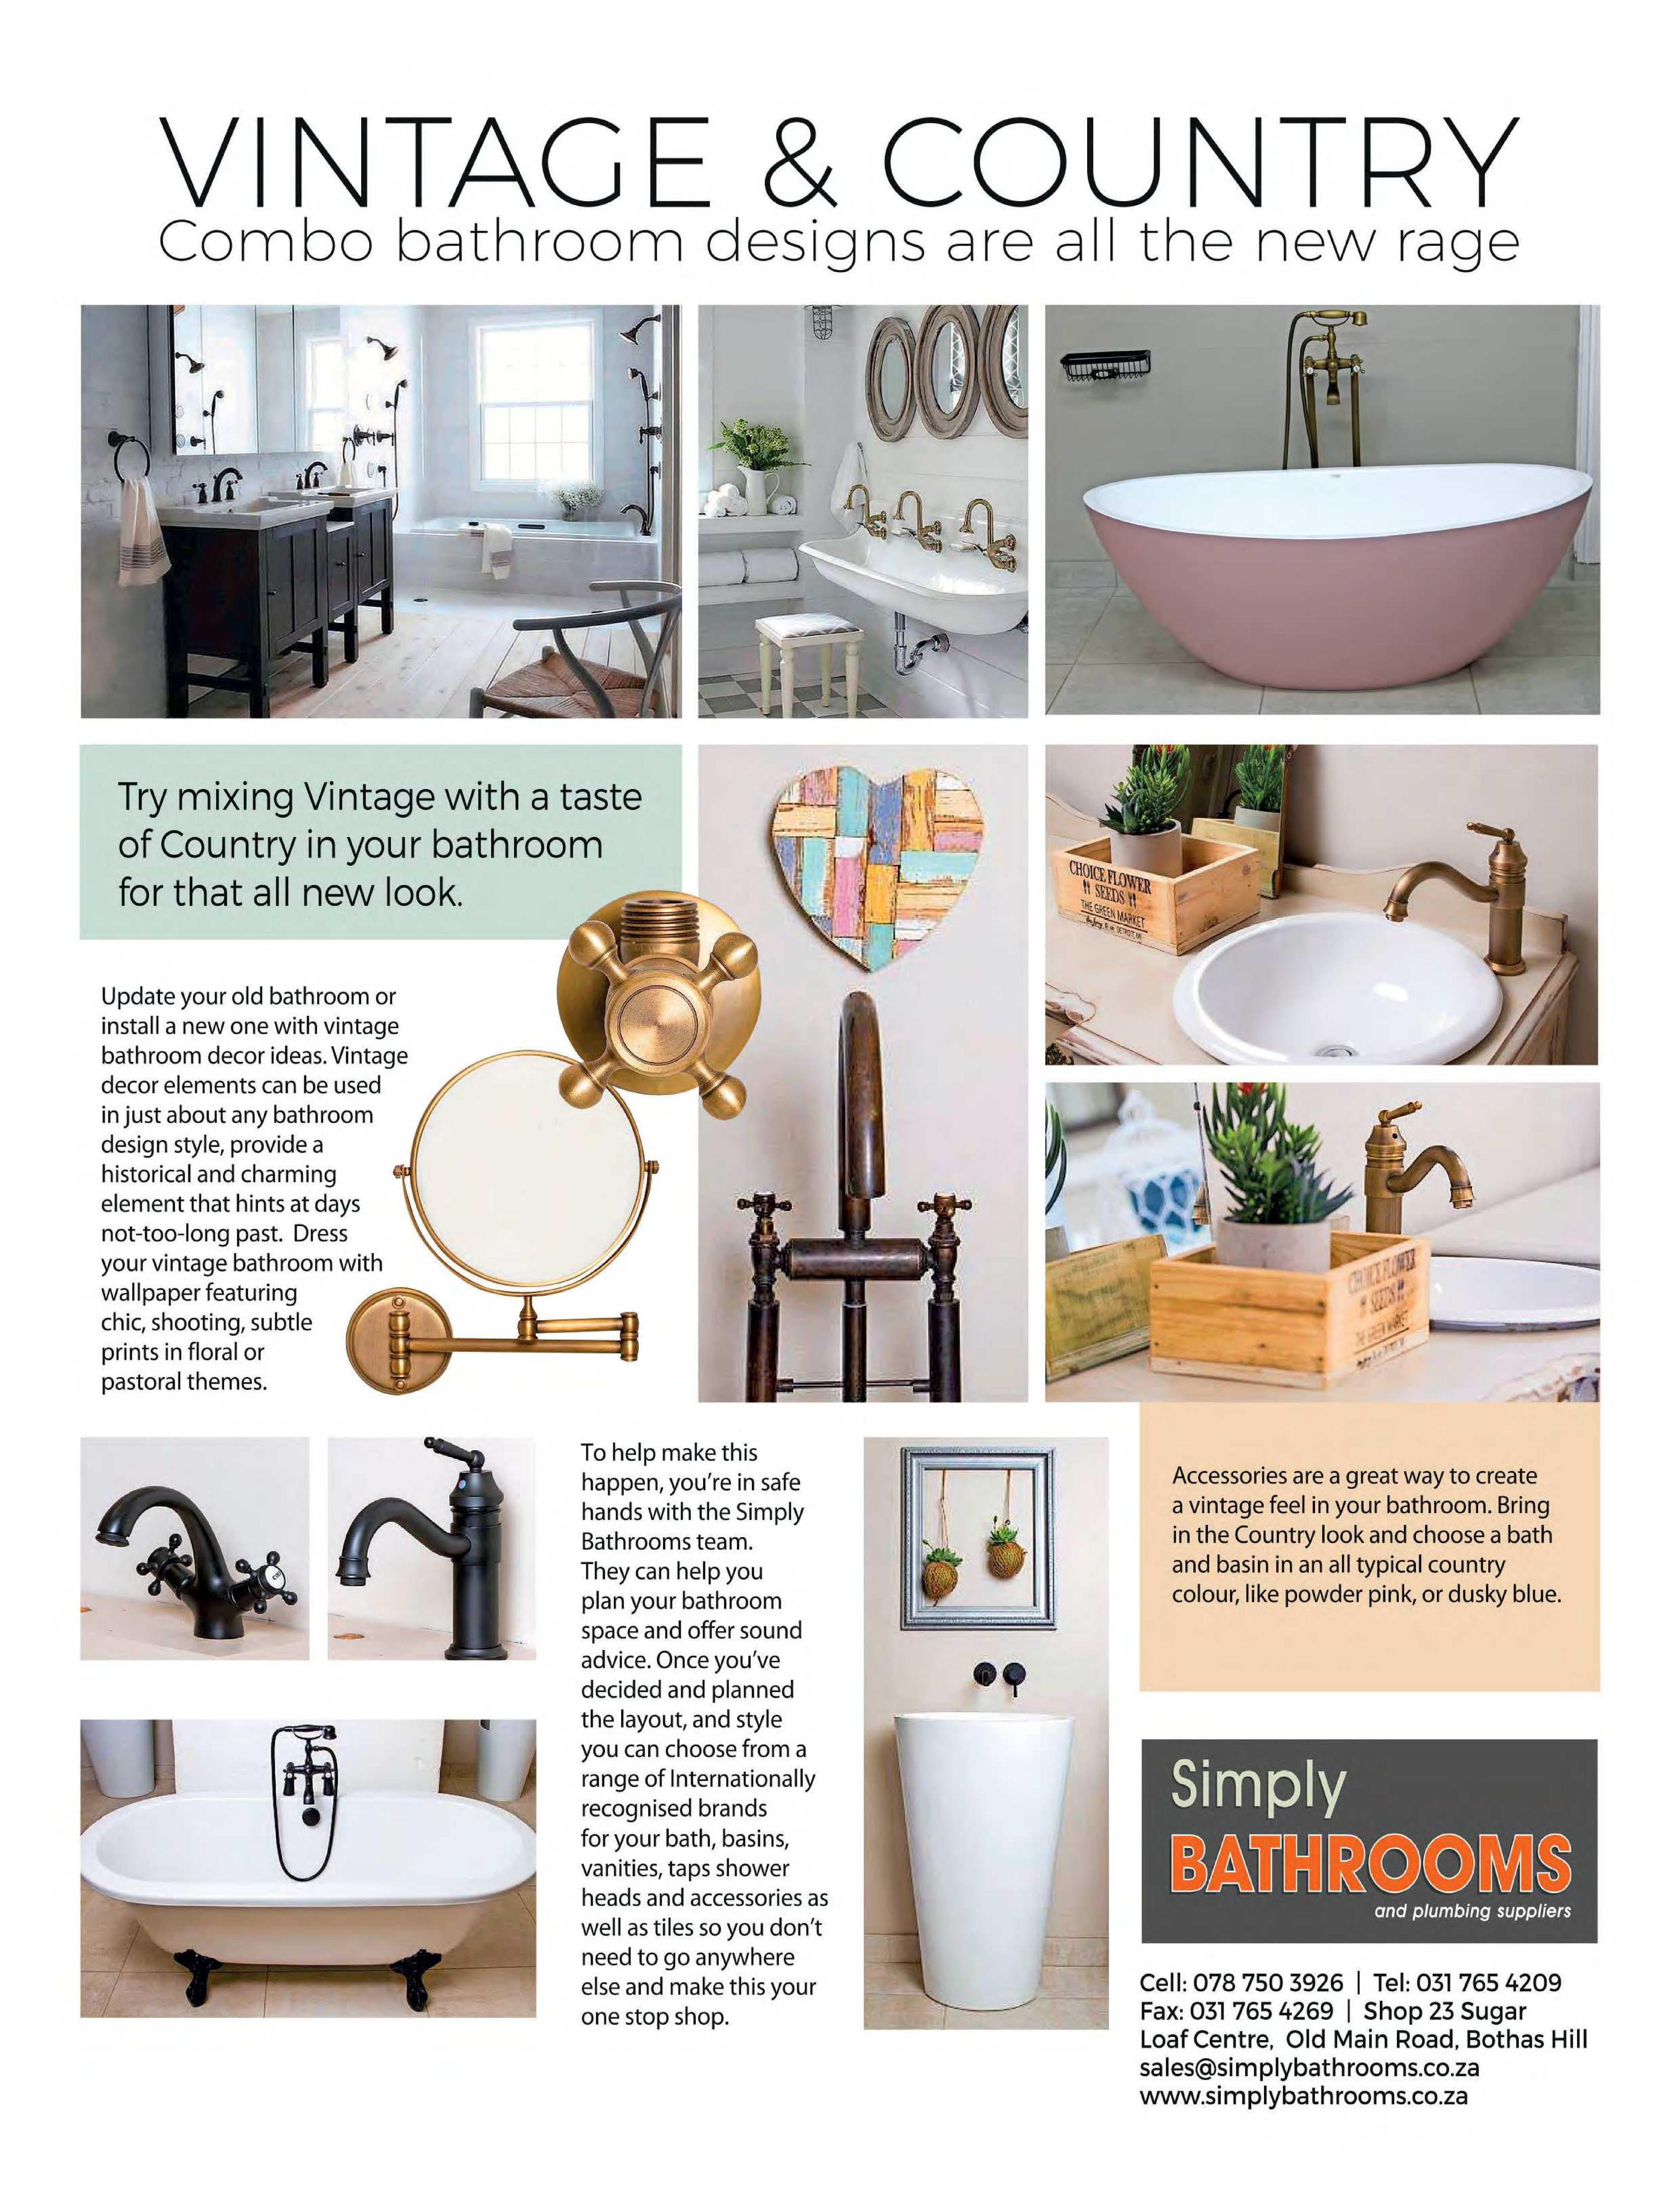 get-magazine-ballitoumhlanga-october-2018-epapers-page-65